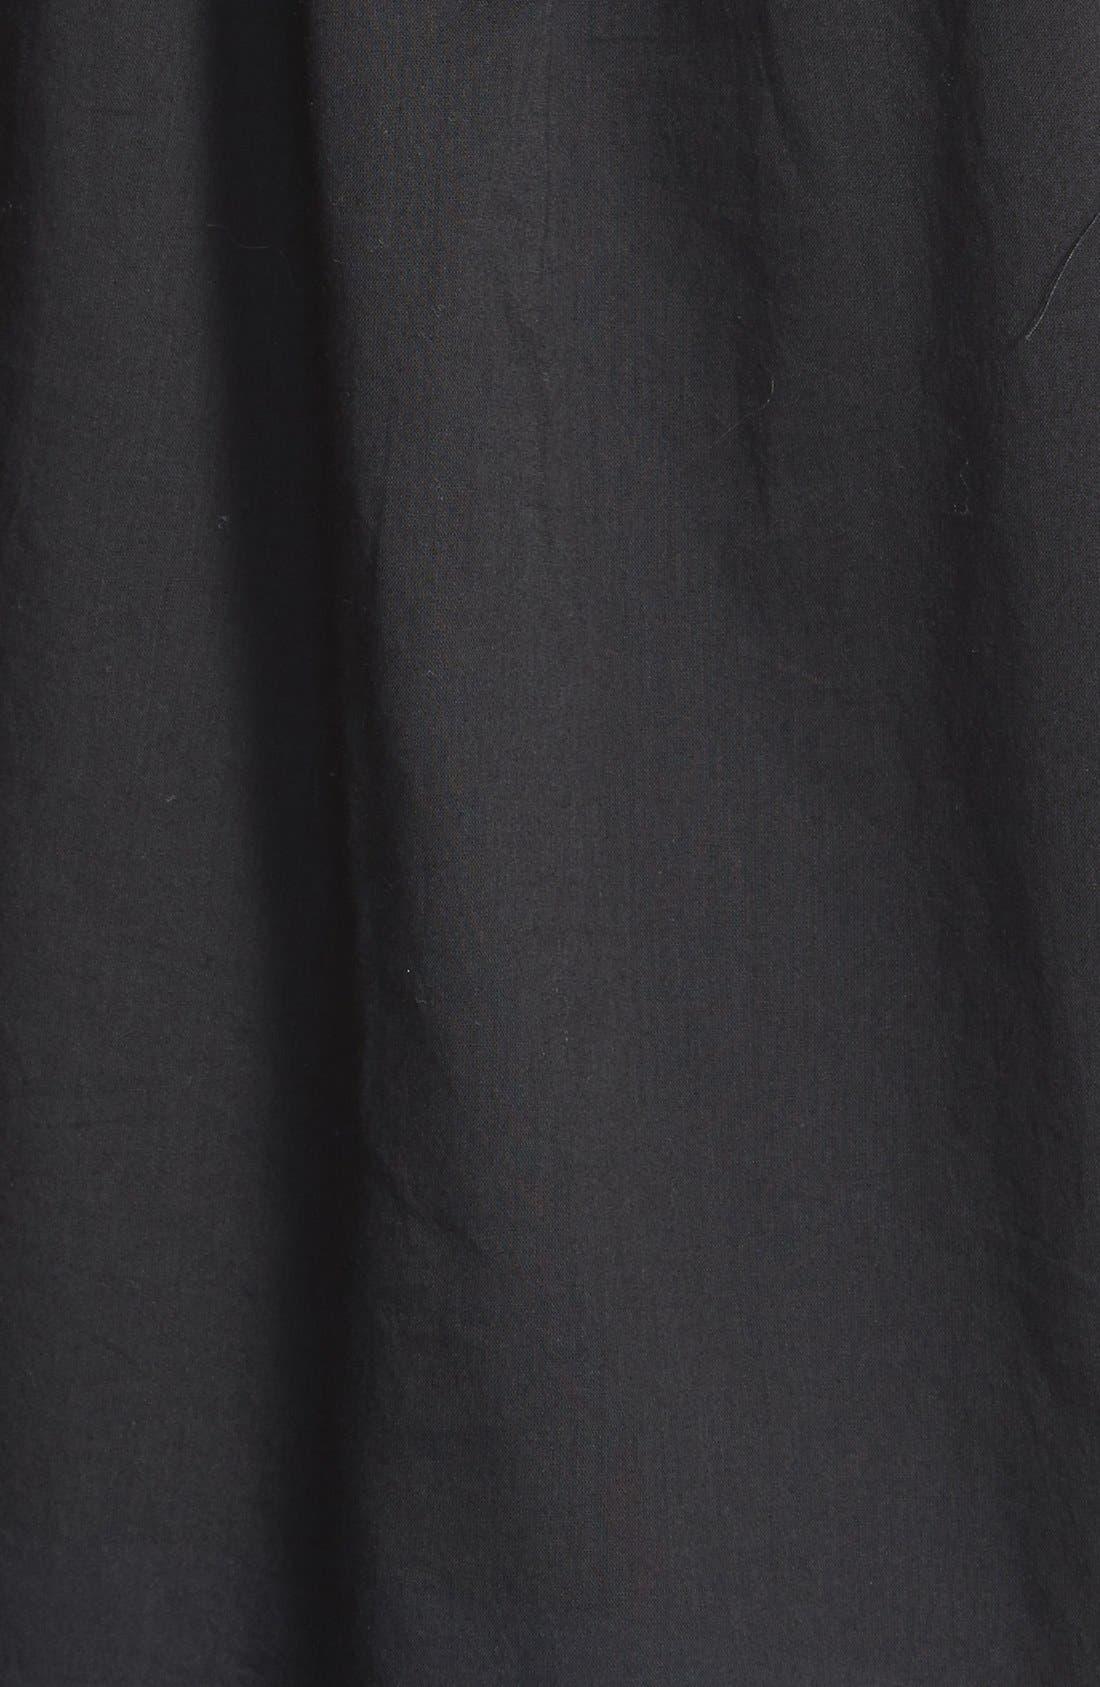 Alternate Image 3  - MICHAEL Michael Kors Eyelet Tie Front Cotton Peasant Top (Regular & Petite)